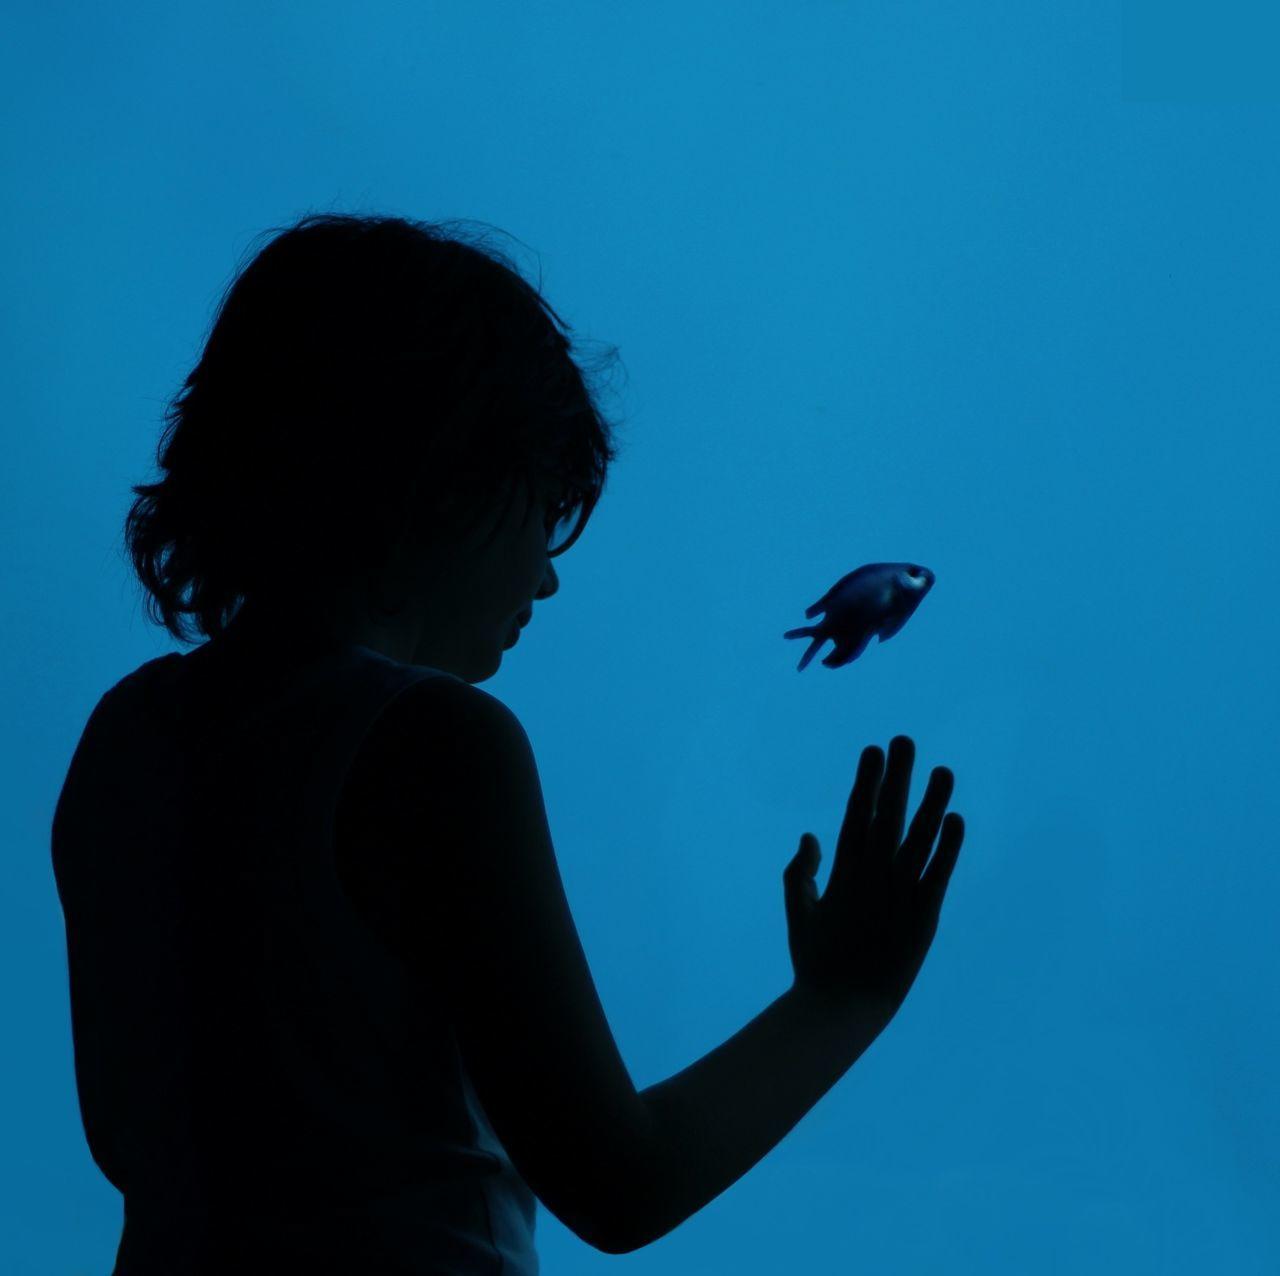 Rear View Of Boy Looking At Fish In Aquarium